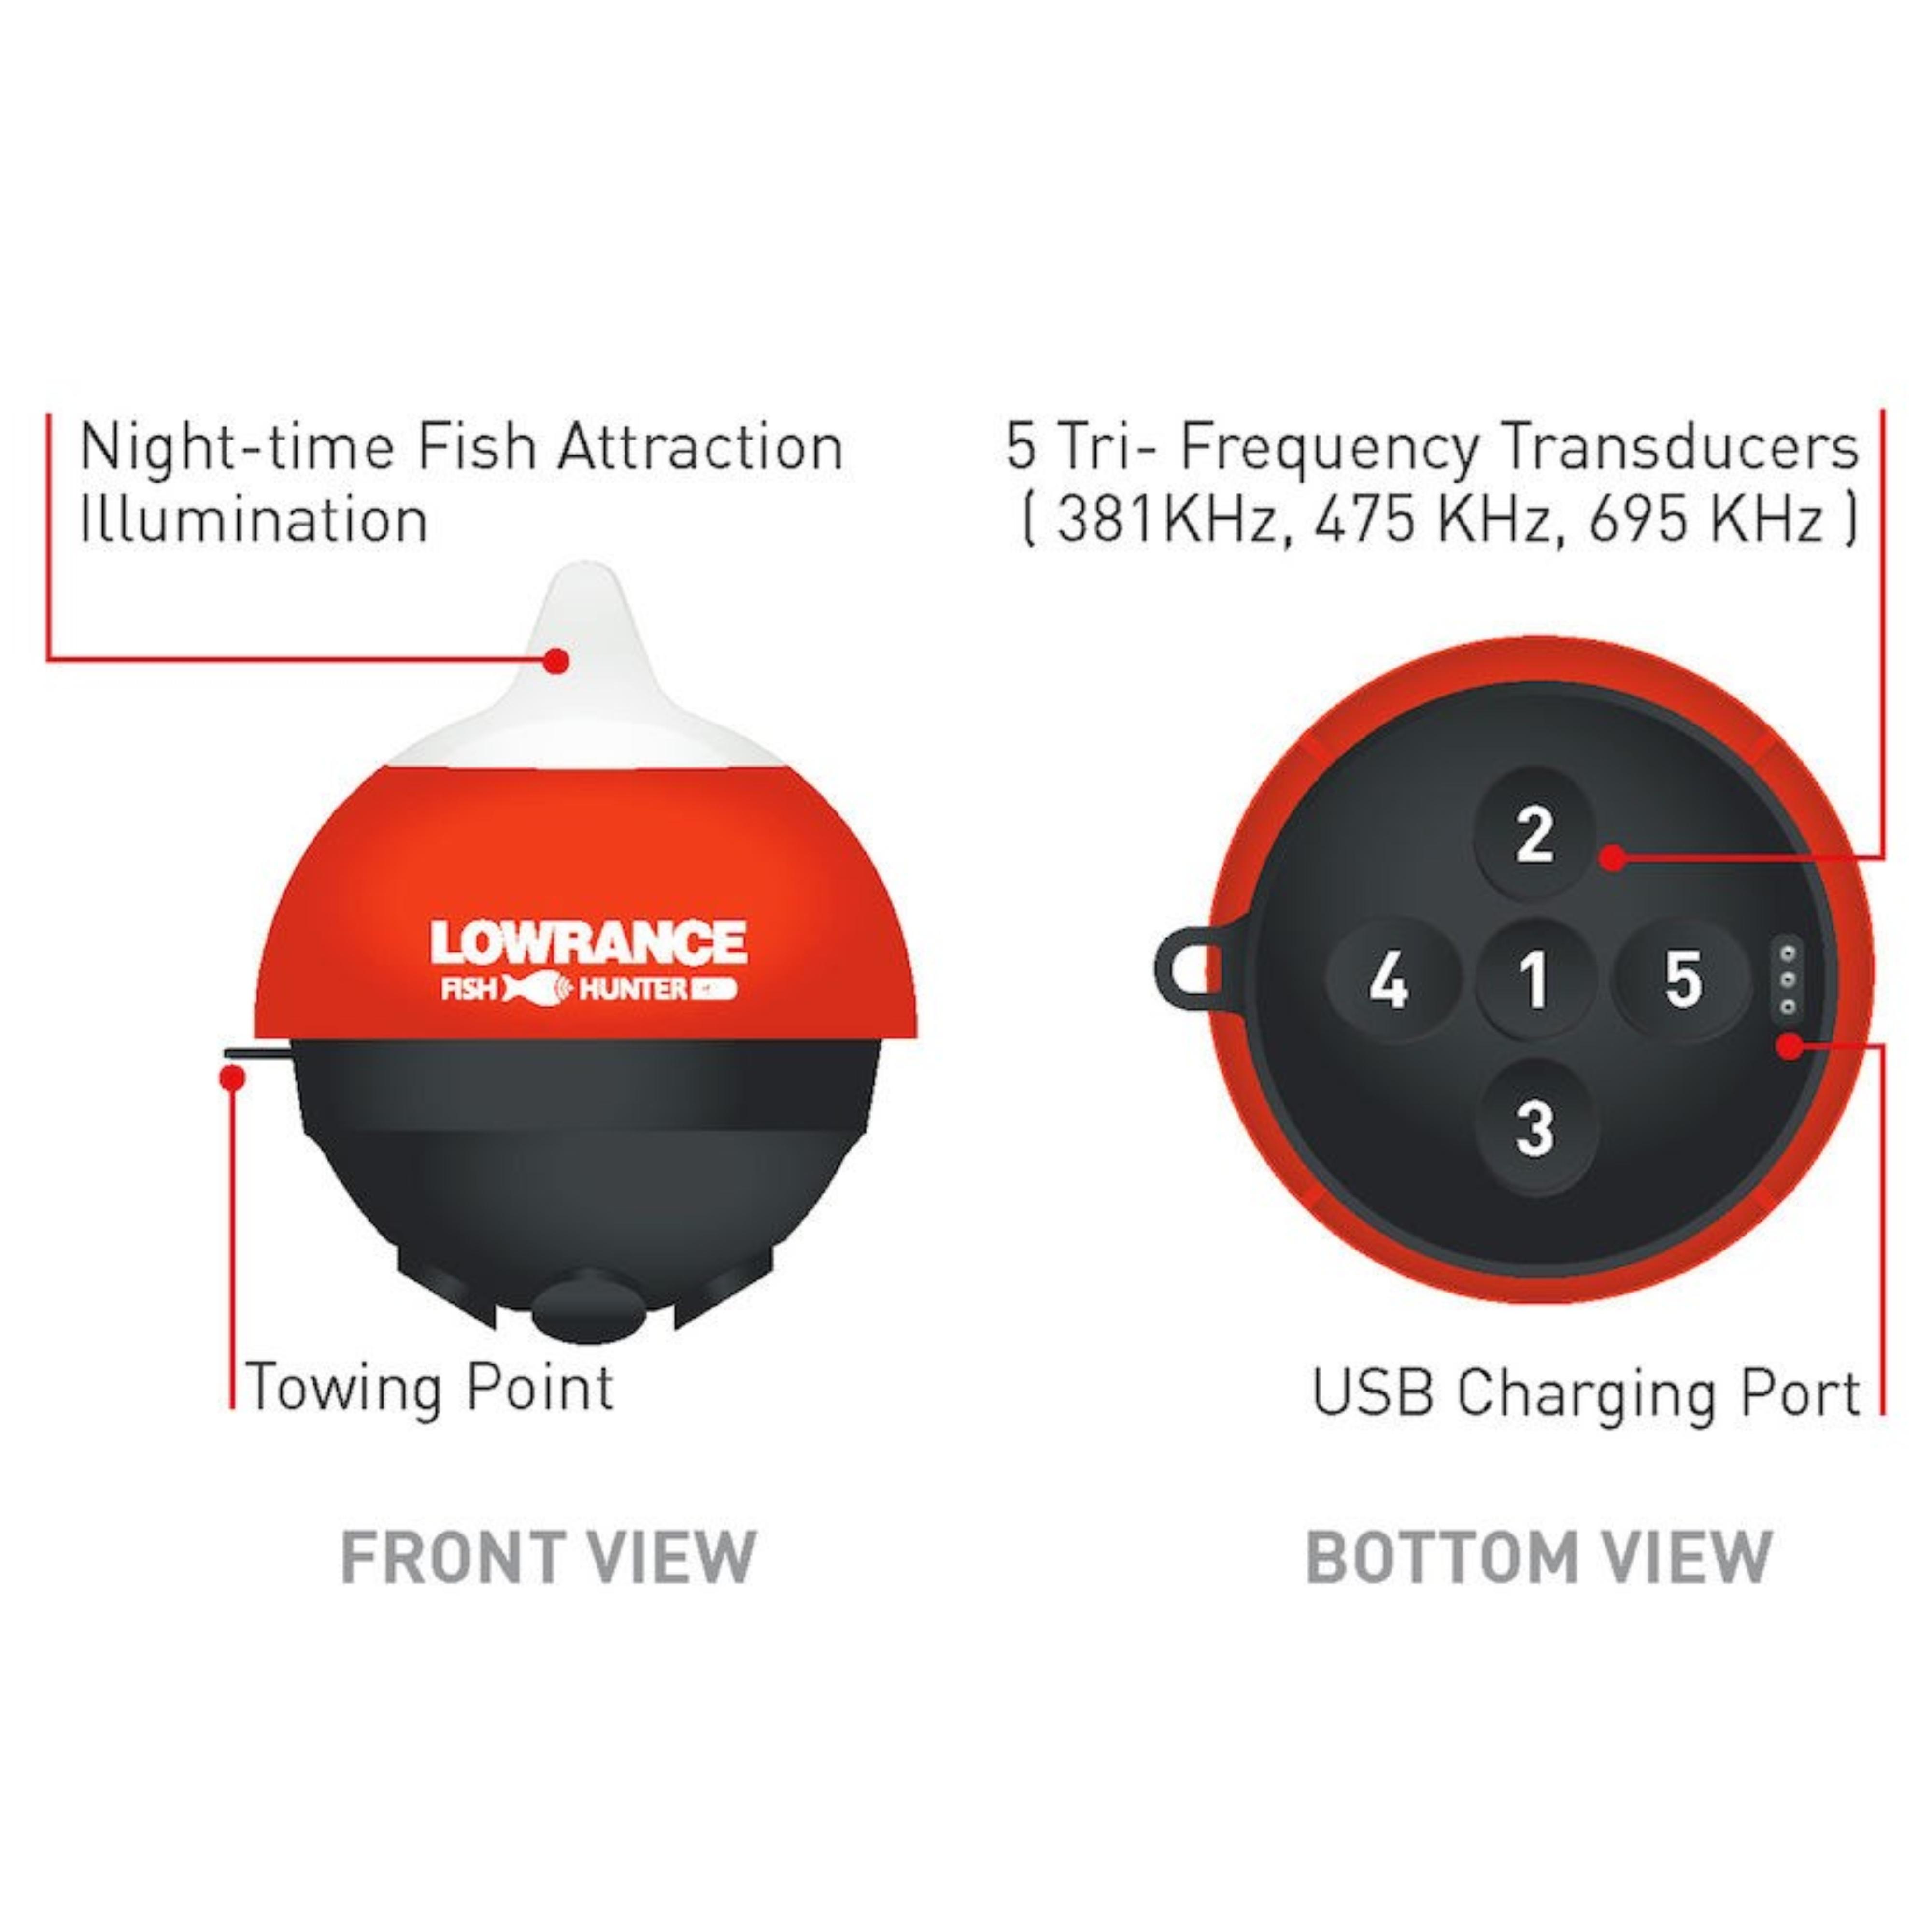 Lowrance FishHunter 3D Wireless FishFinder Transducer